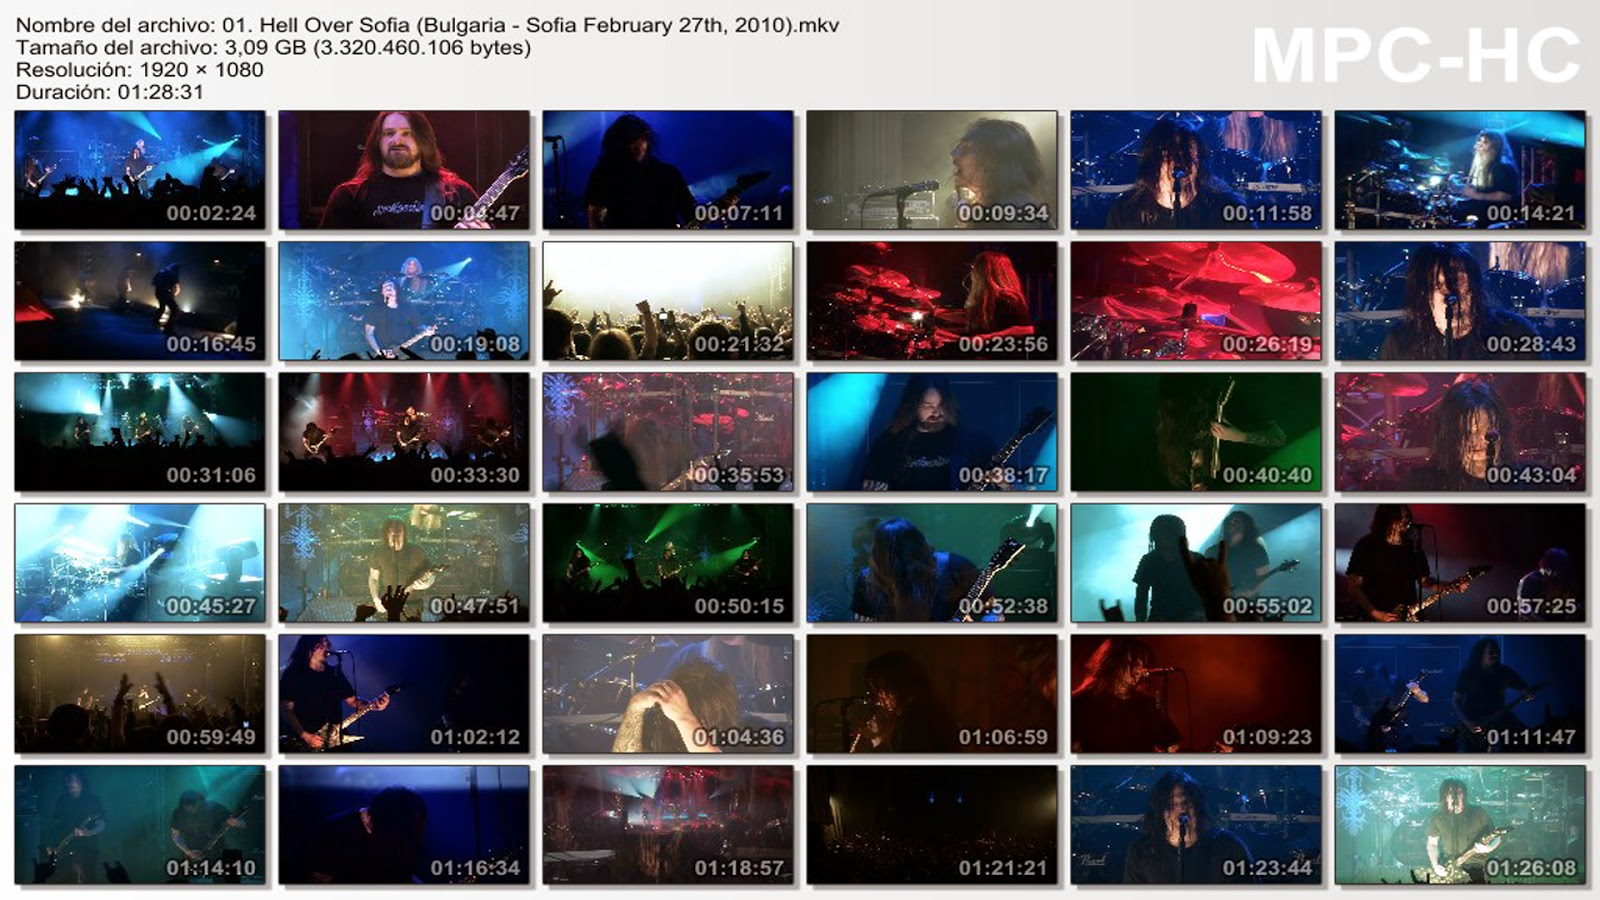 Hypocrisy |Hell Over Sofia + Documental |1080p.